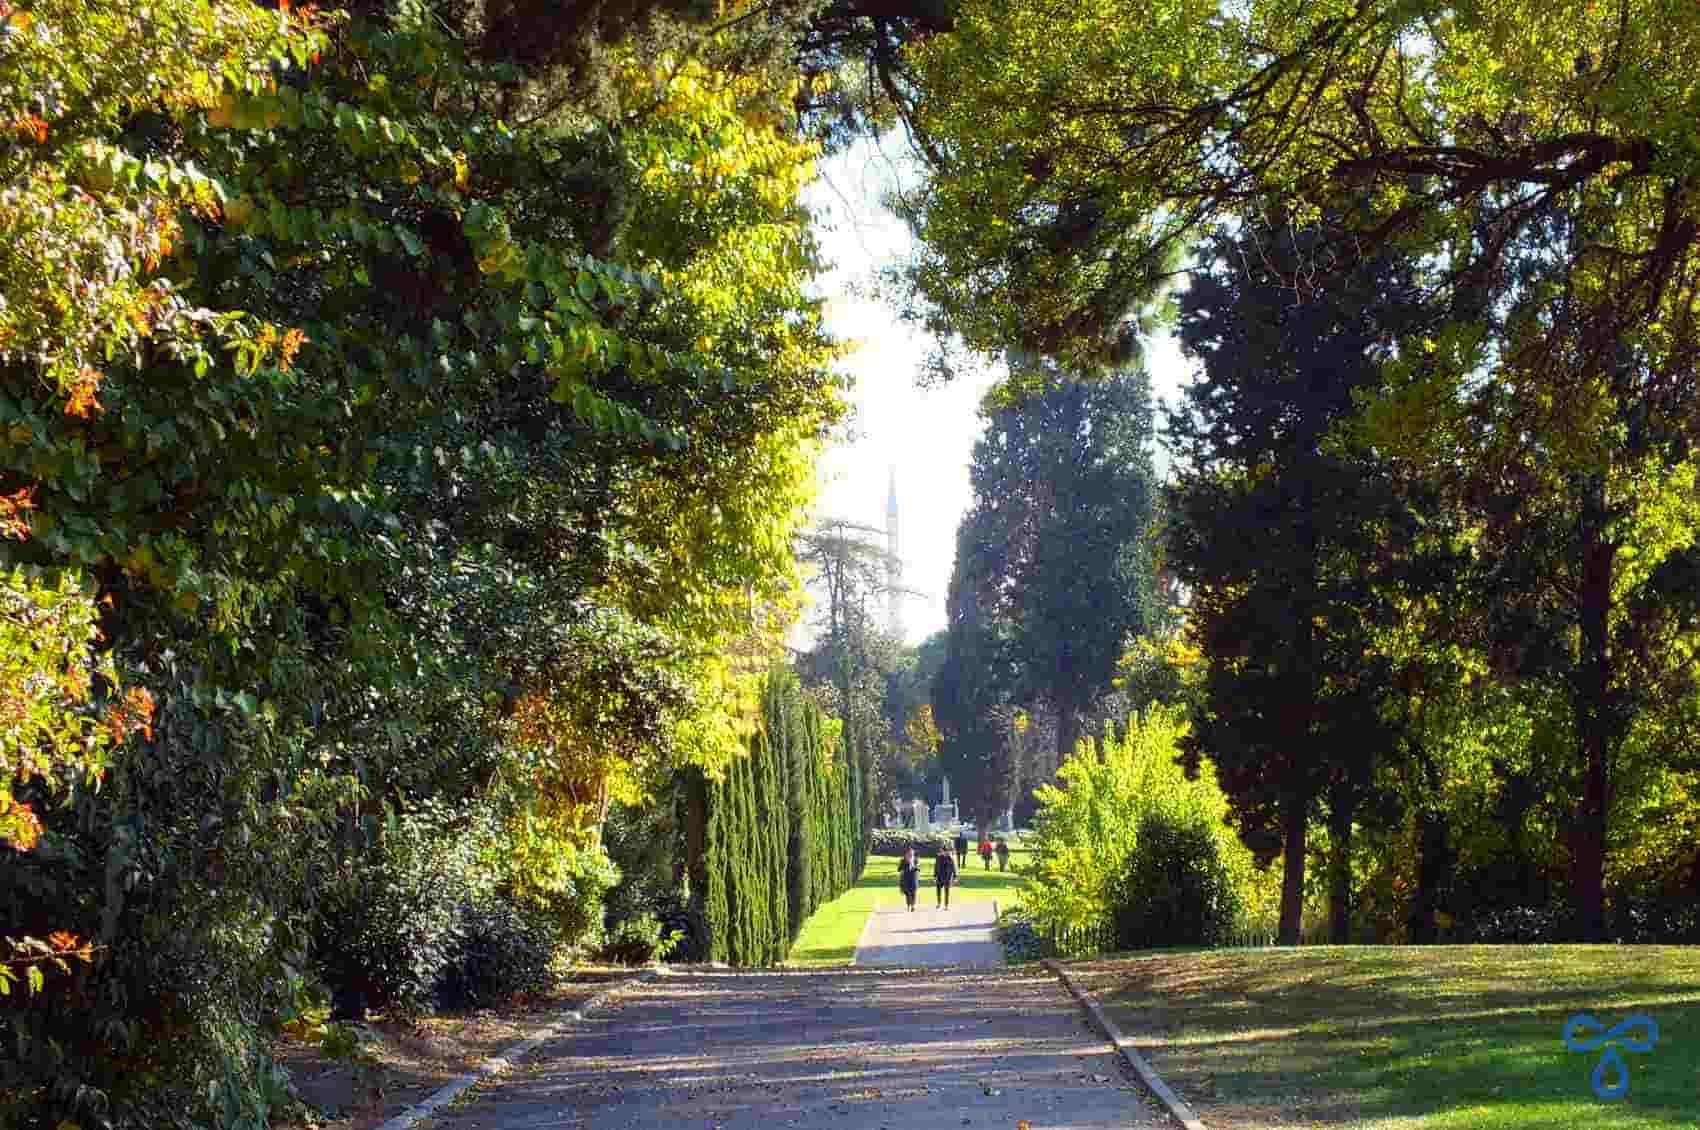 Leafy Haydarpaşa War Cemetery